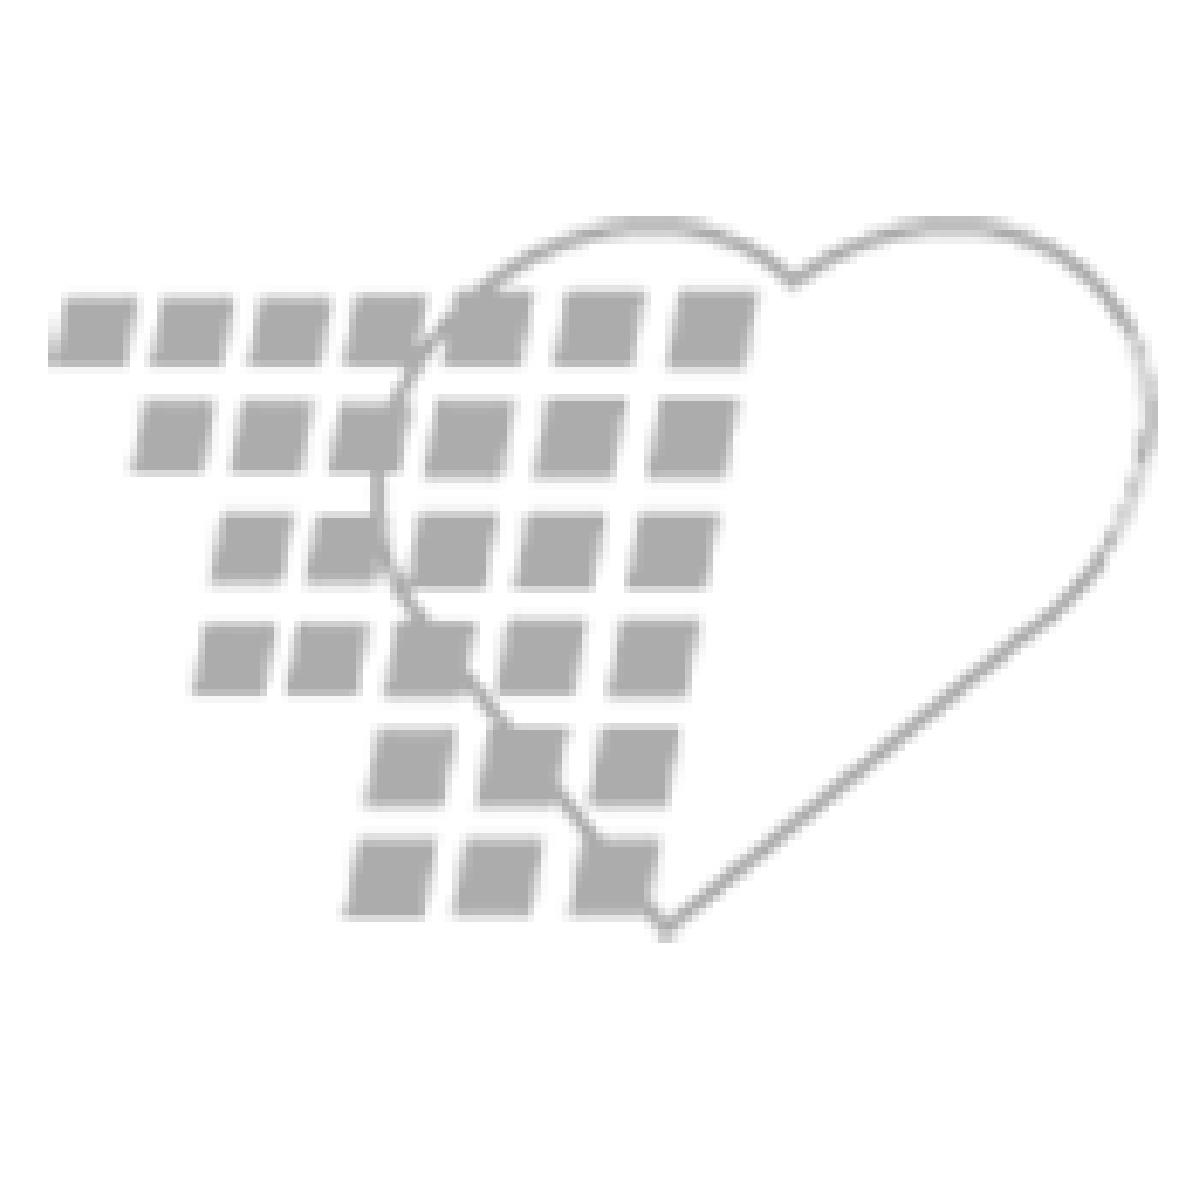 02-30-1740 Microhematocrit Tubes 40mm Glass